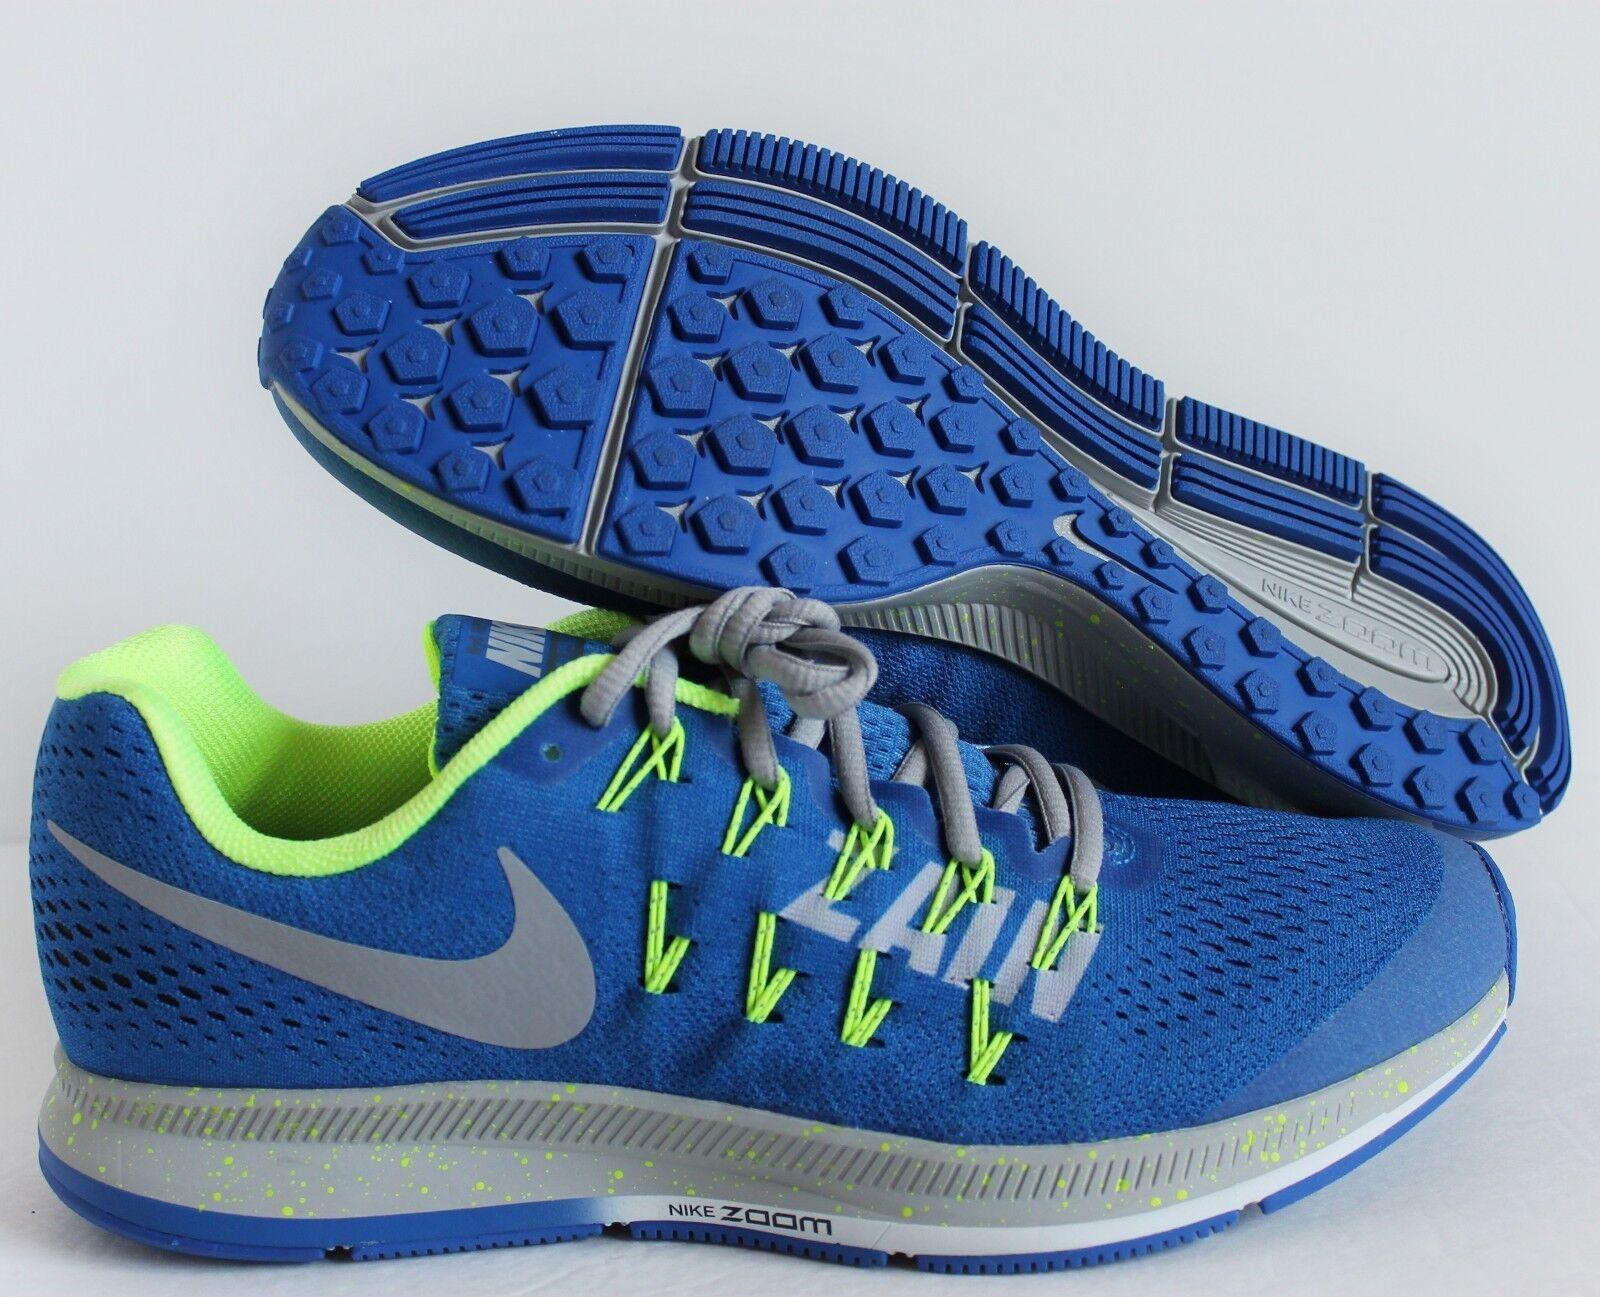 Nike Men Zoom Pegasus 33 iD bluee-Grey-Volt SZ 10